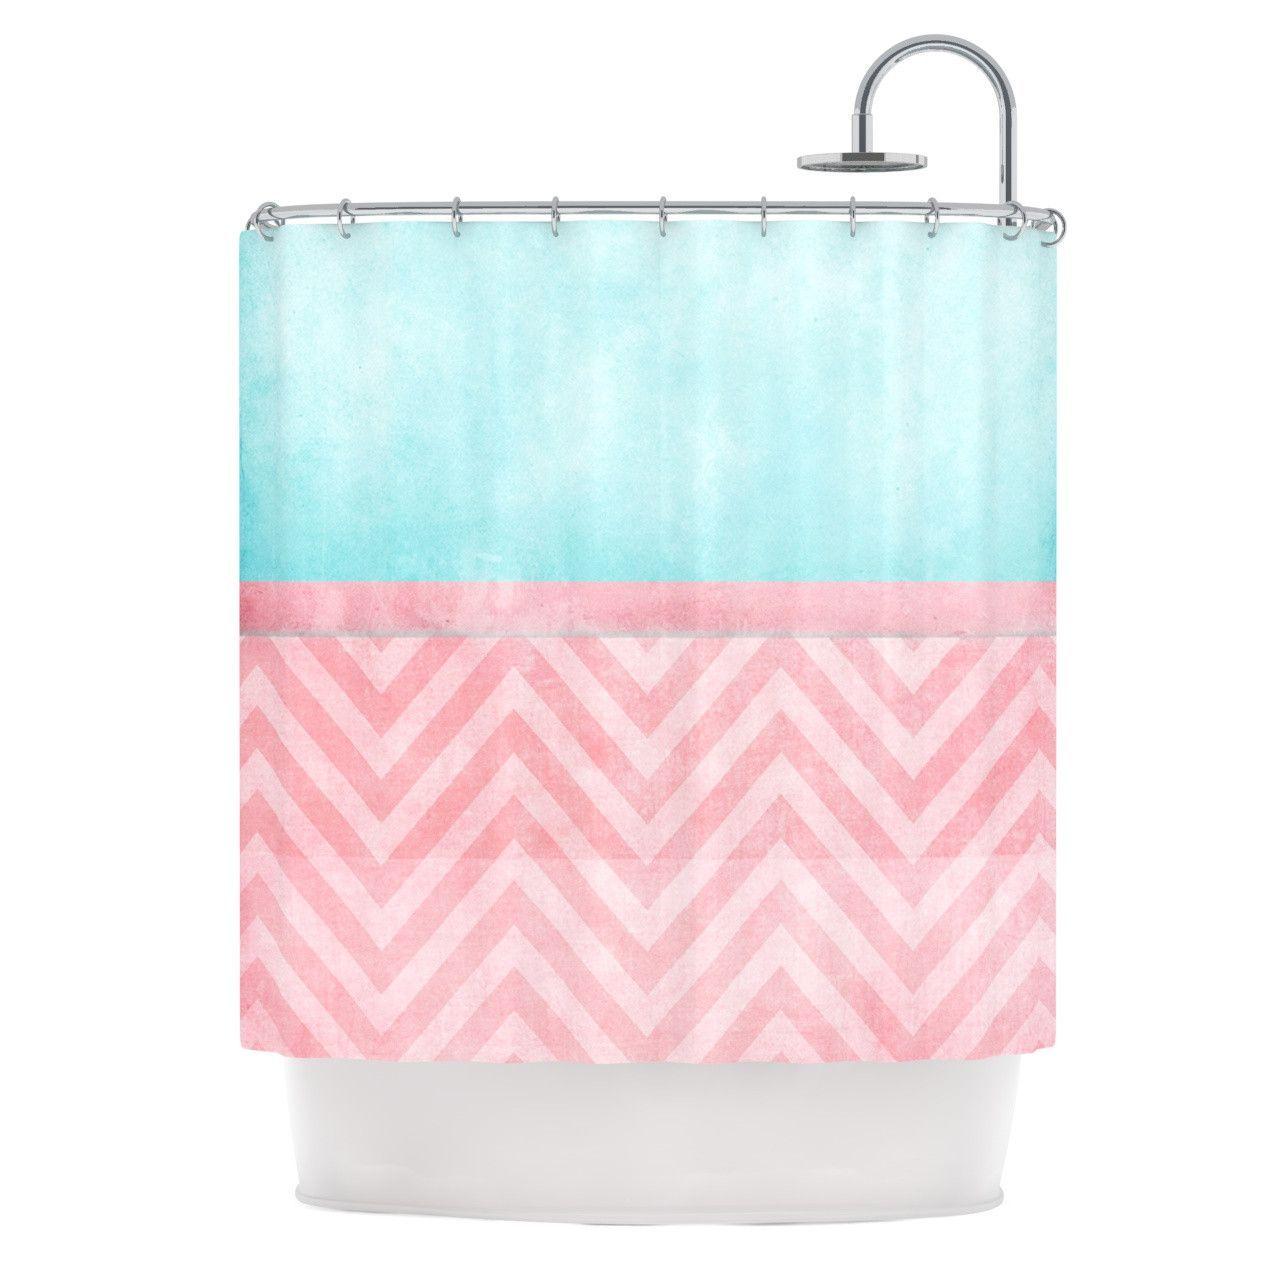 Aqua chevron shower curtain - Ingrid Beddoes Light Chevron Pink Turquoise Blush Aqua Shower Curtain